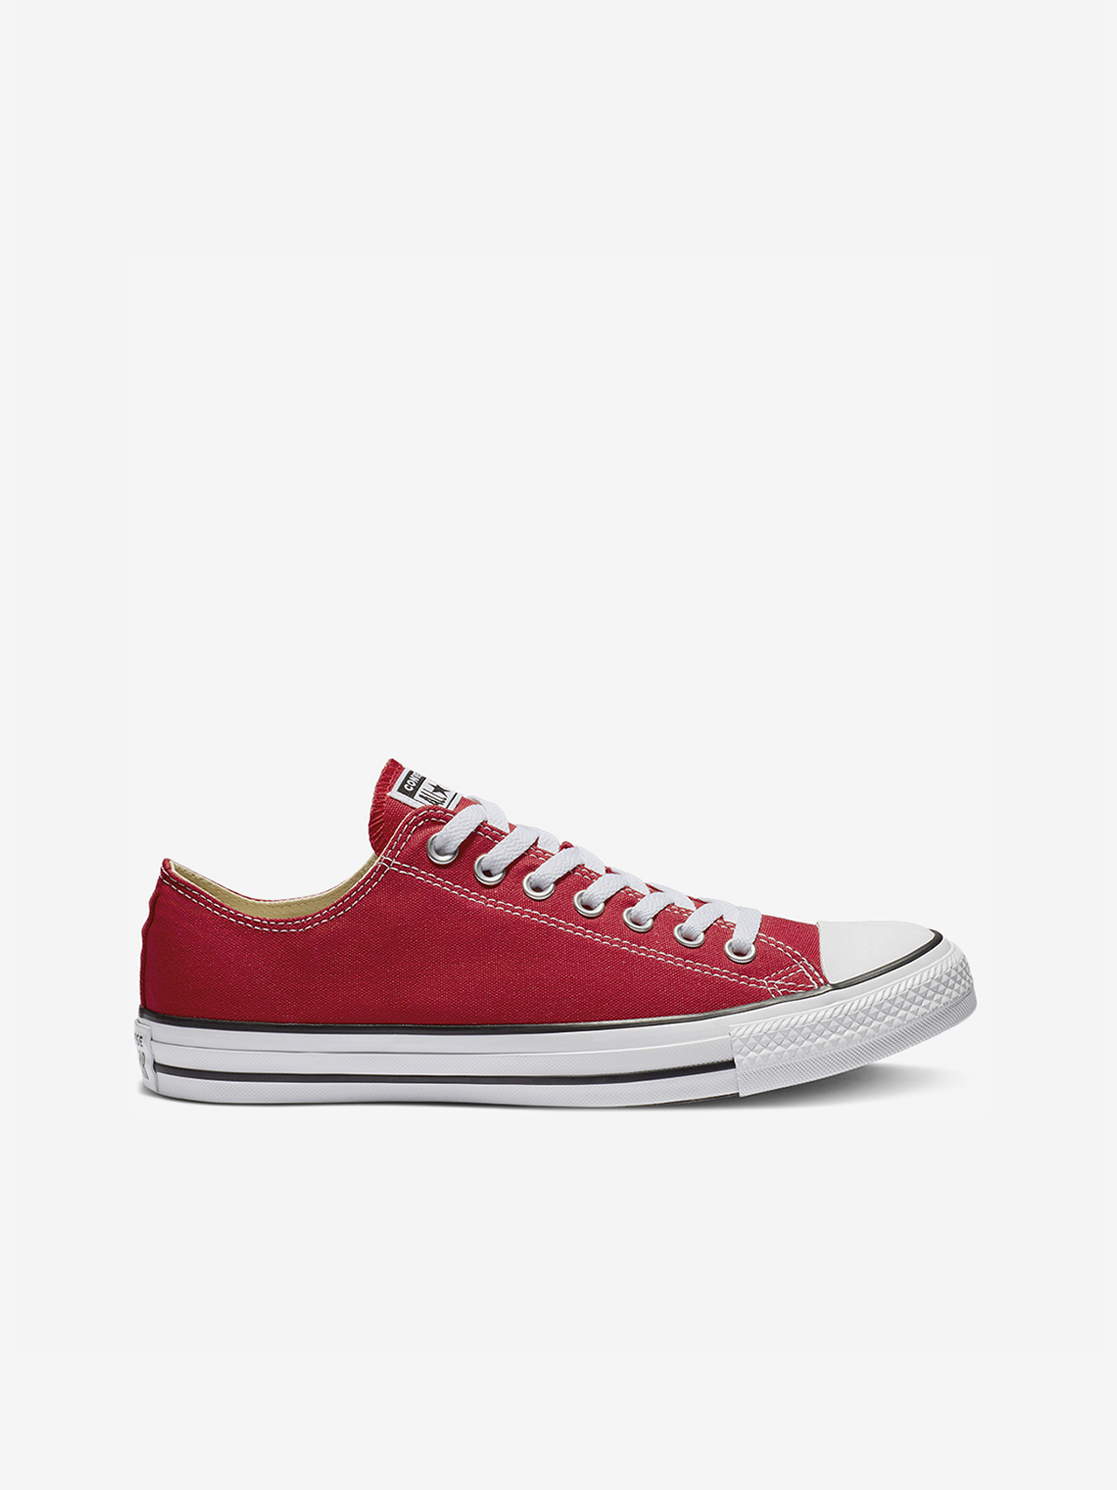 Converse červené tenisky Chuck Taylor All Star Classic Colors - 37,5